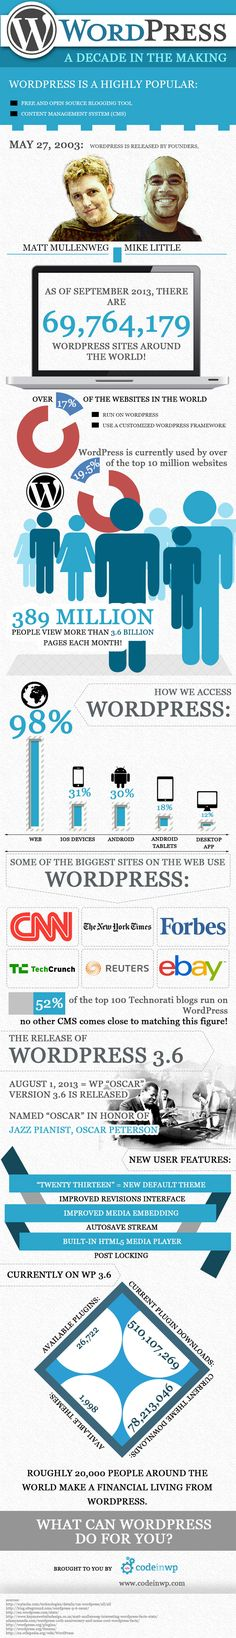 WordPress: a Decade in the Making, an infographic - http://hosting.ber-art.nl/wordpress-a-decade-in-the-making-an-infographic /@Roberta Causarano Cruz Malonda|Art Visual Design V.O.F. - #SEO